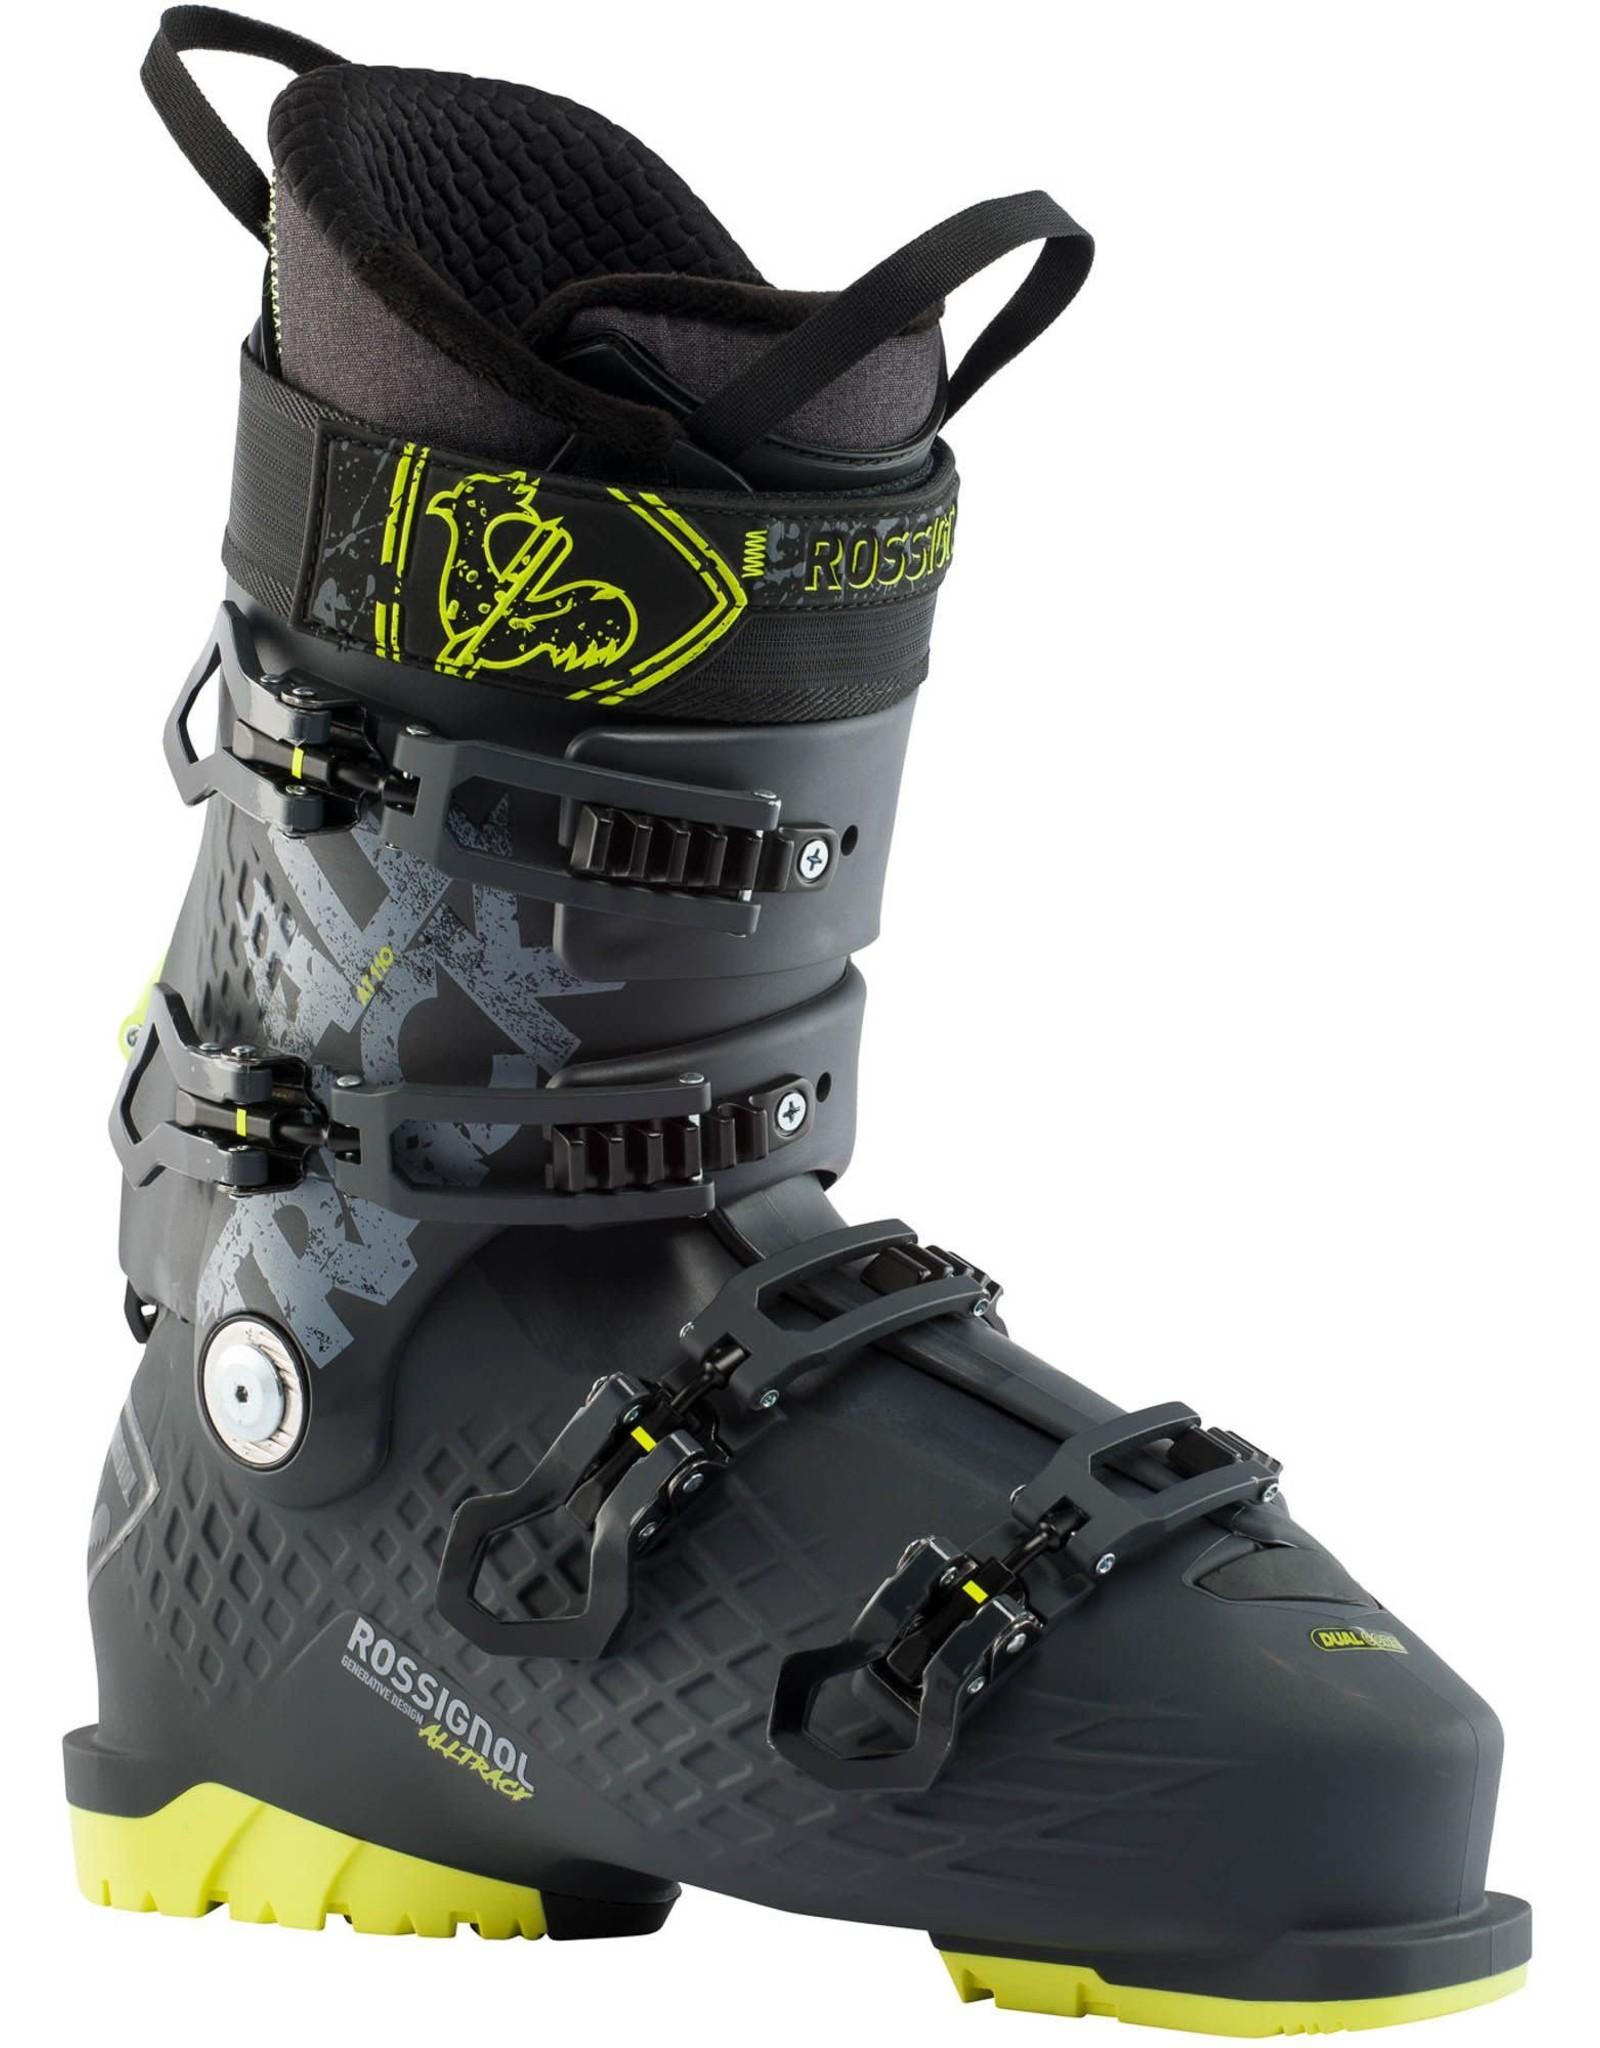 ROSSIGNOL Rossignol Alltrack 110 men alpine ski boot charcoal 22